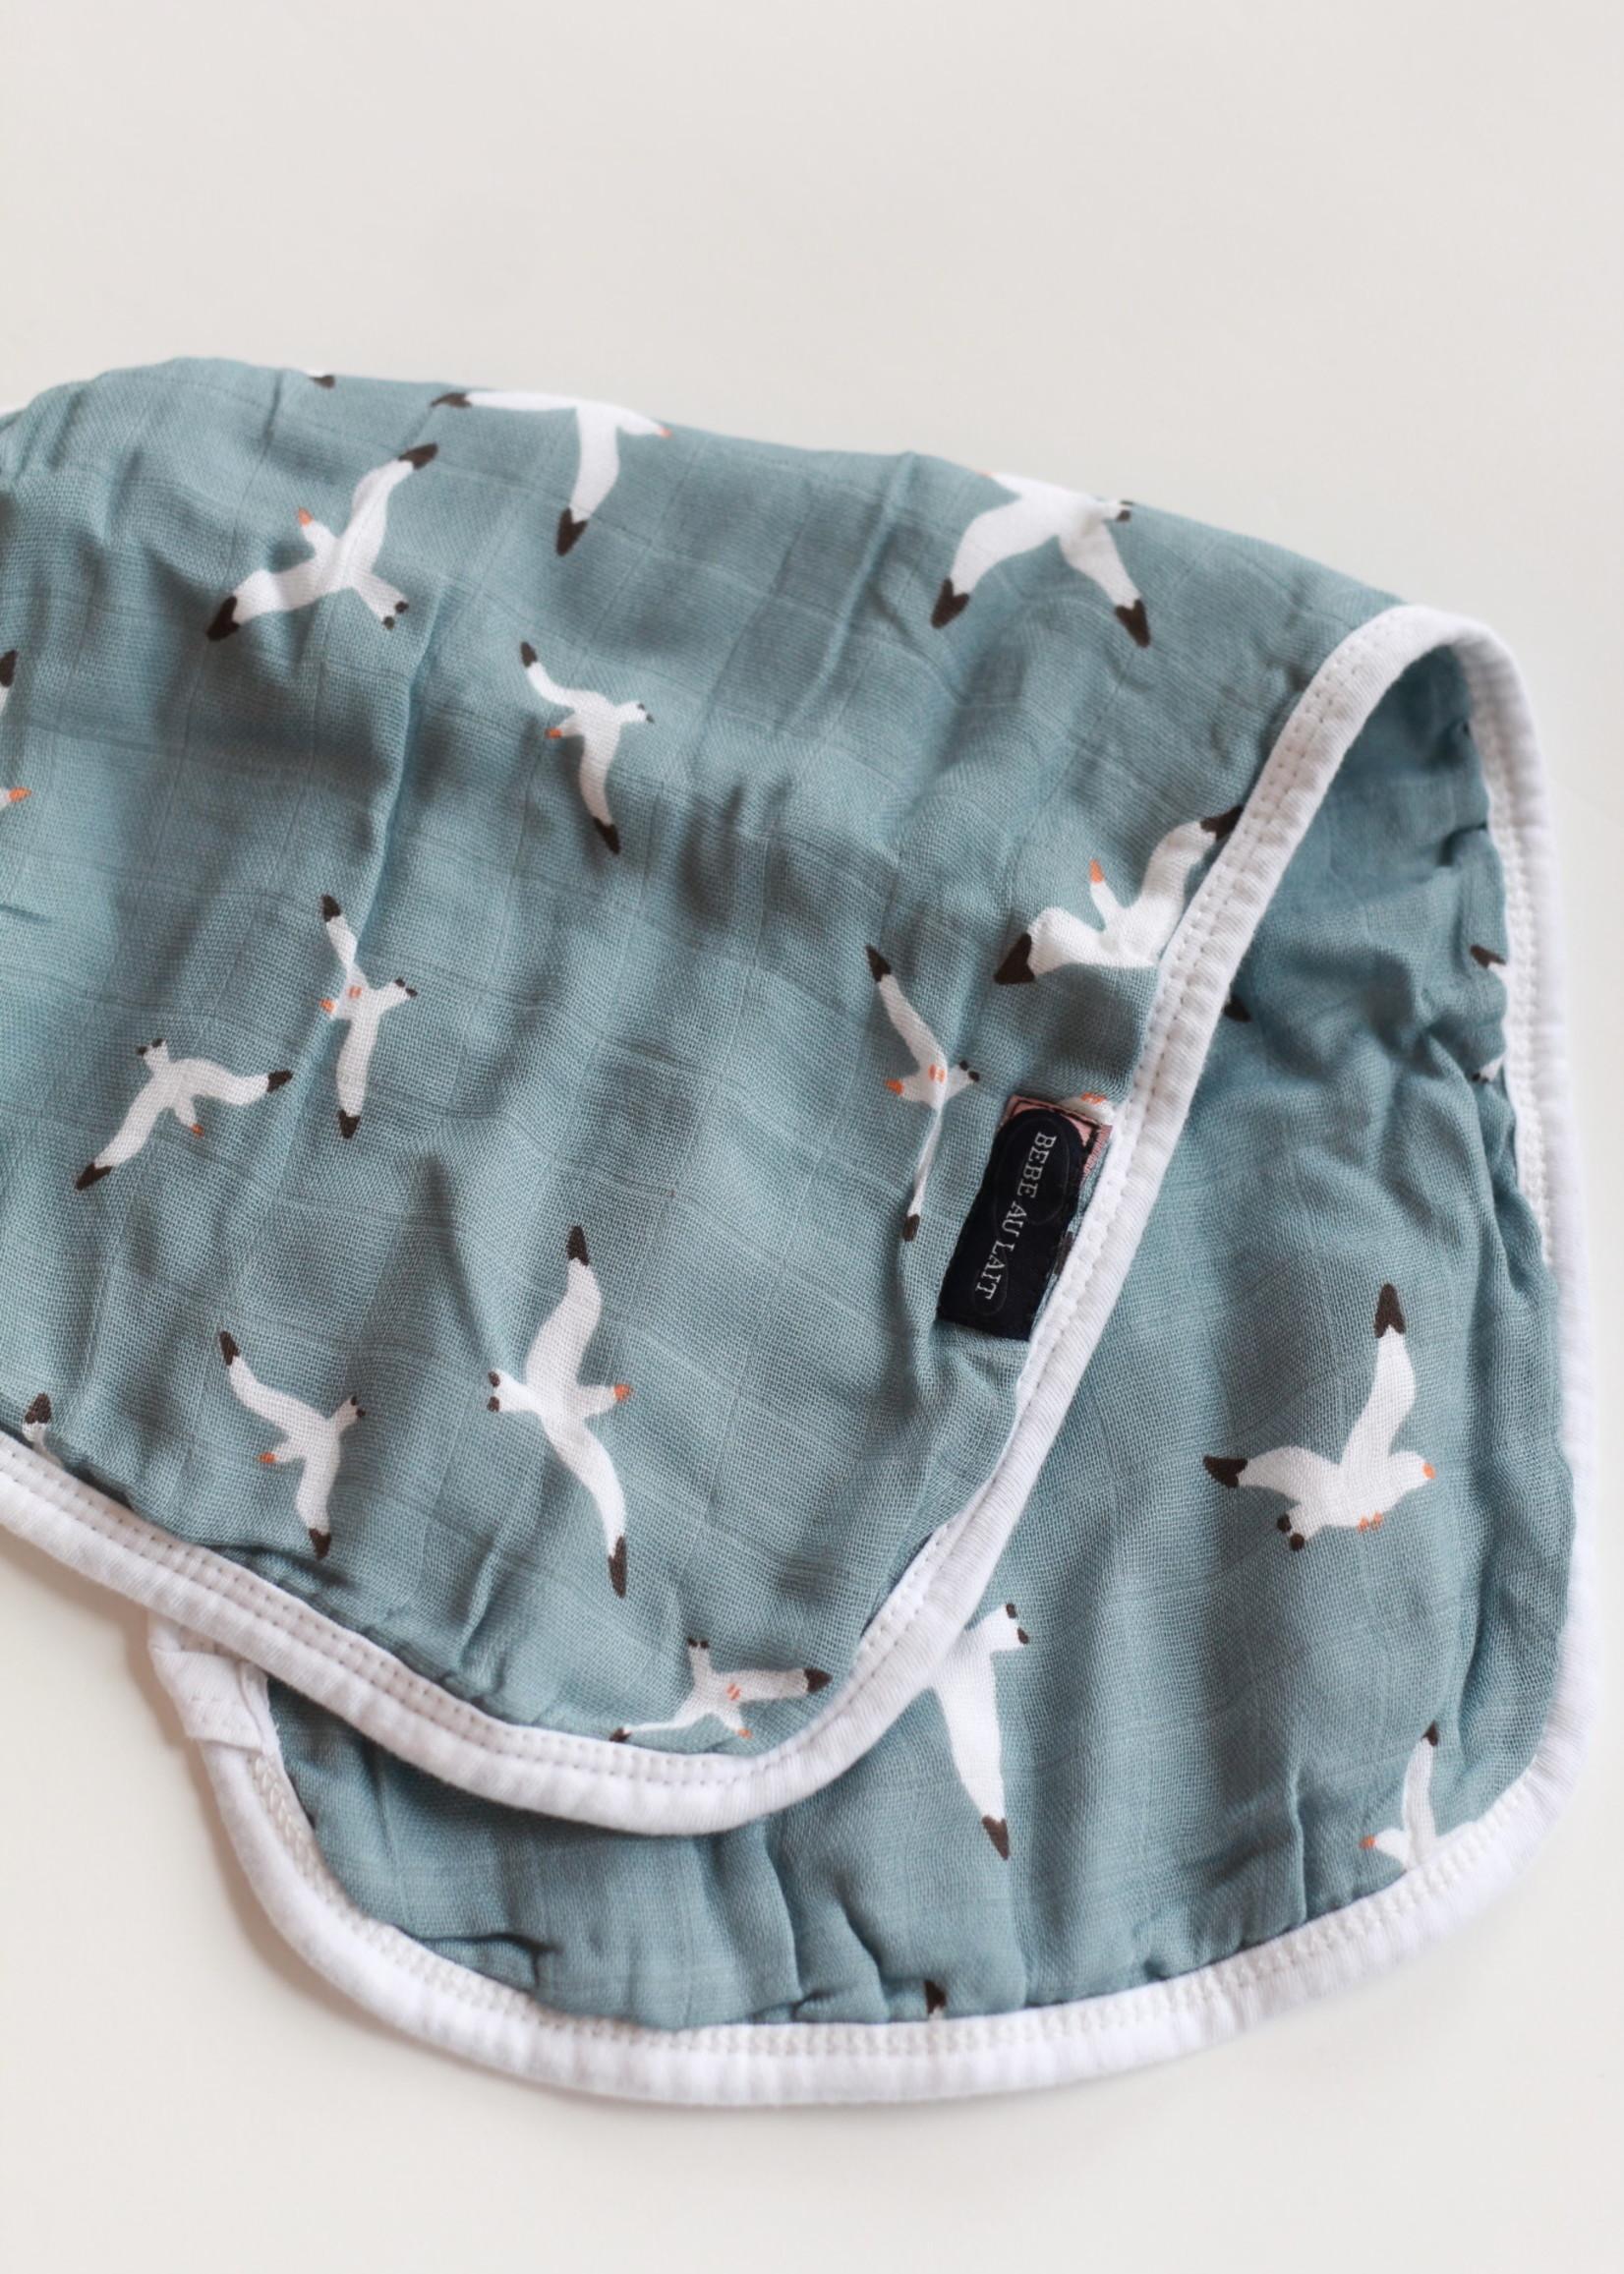 Bebe Au Lait Seagulls Oh-So-Soft Muslin Burp Cloth